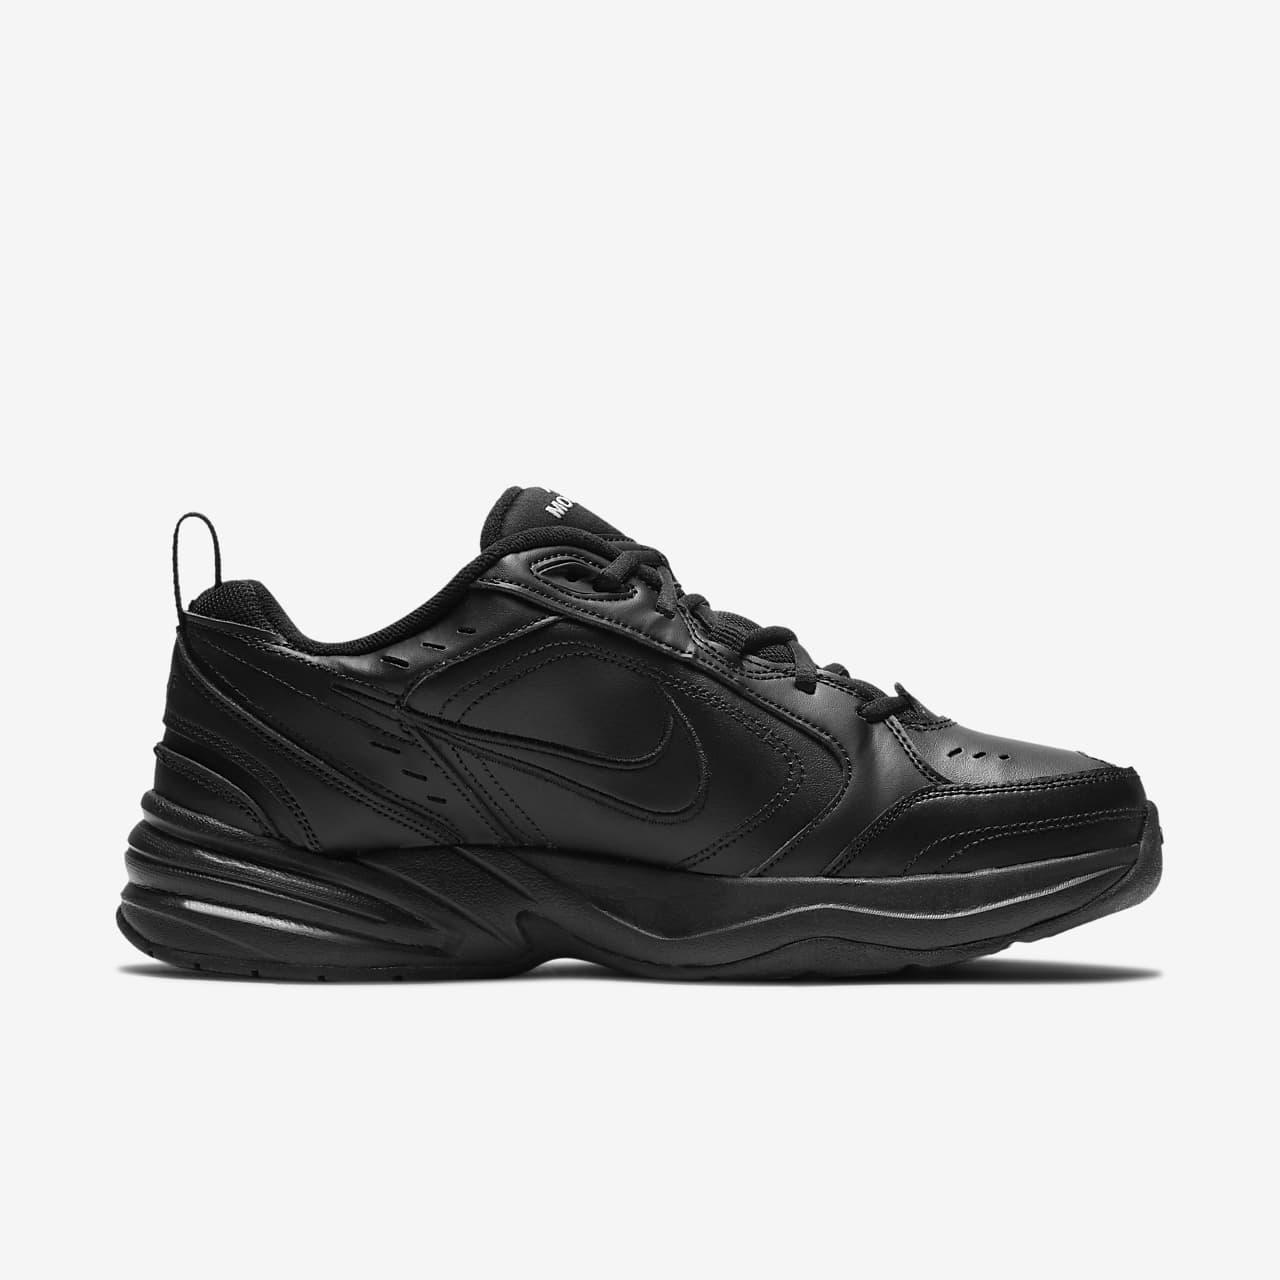 outlet online the best attitude footwear Chaussure de fitness et lifestyle Nike Air Monarch IV. Nike FR